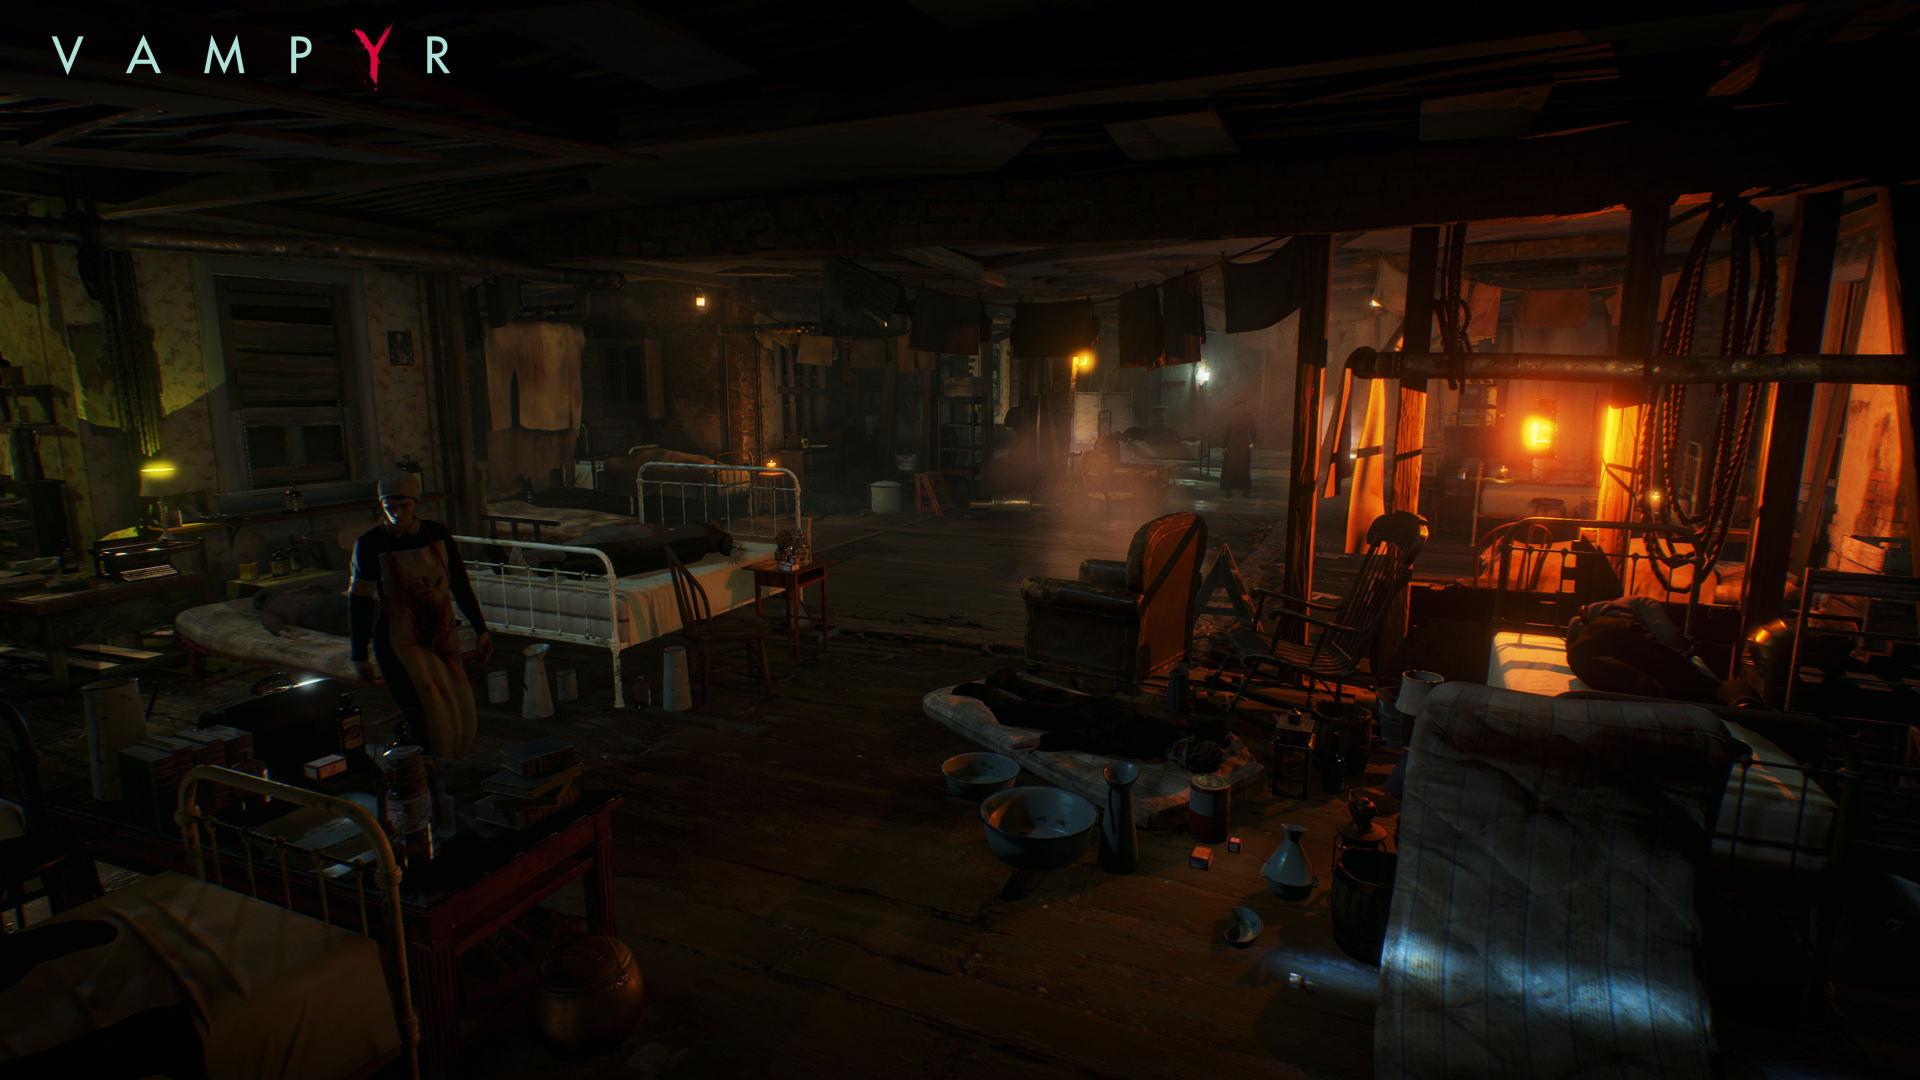 Vampyr 2017 Game HD Games 4k Wallpapers Images